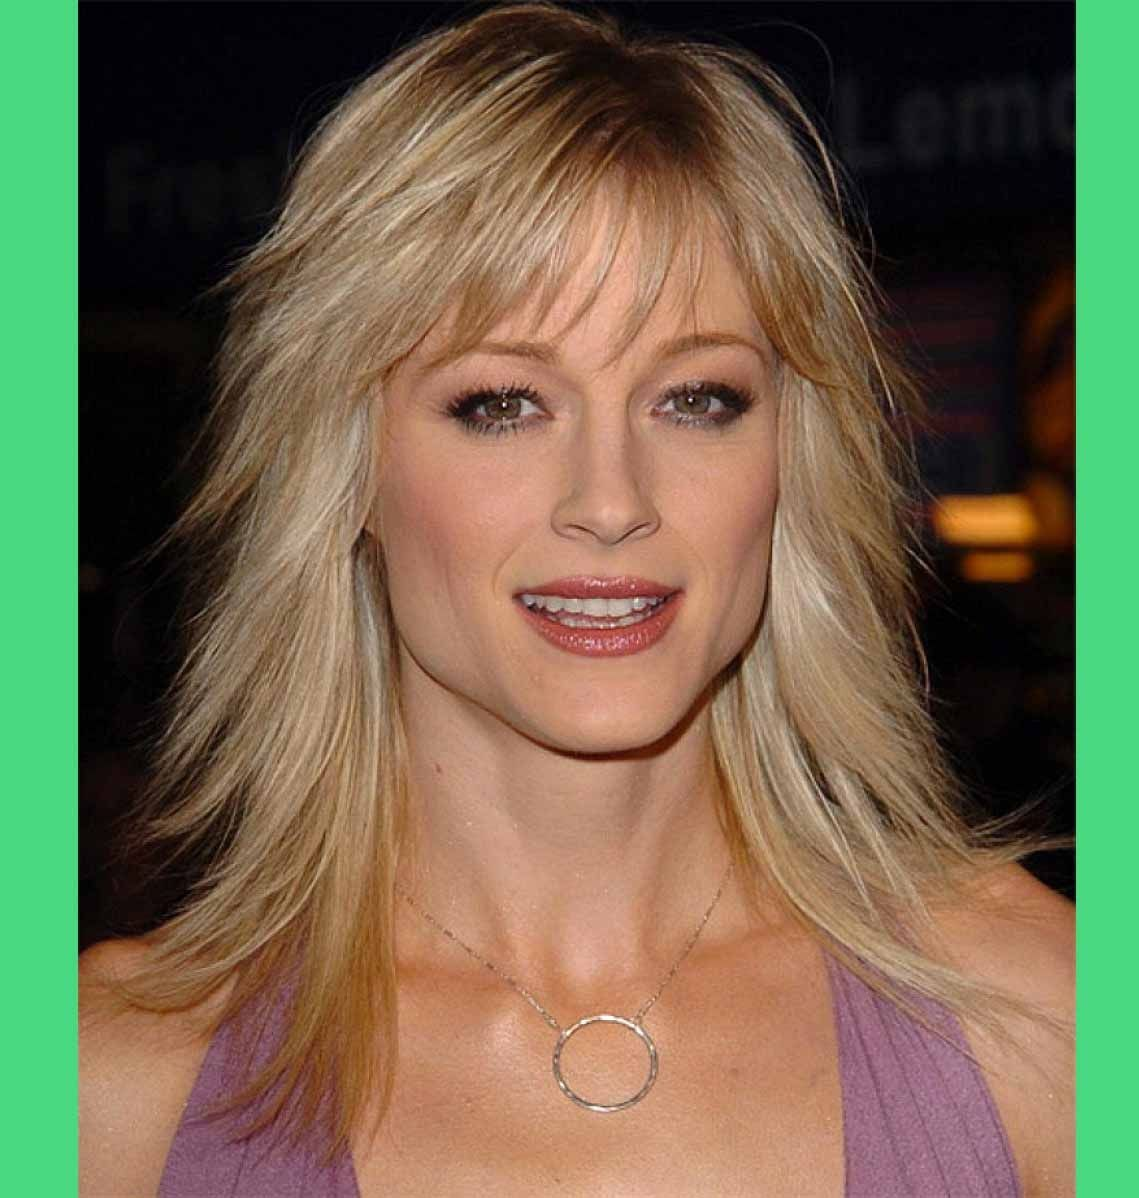 Hairstyles For Fine Straight Hair Medium Length Hairstyles Fine Straight Hair Medium Length Hairstyles